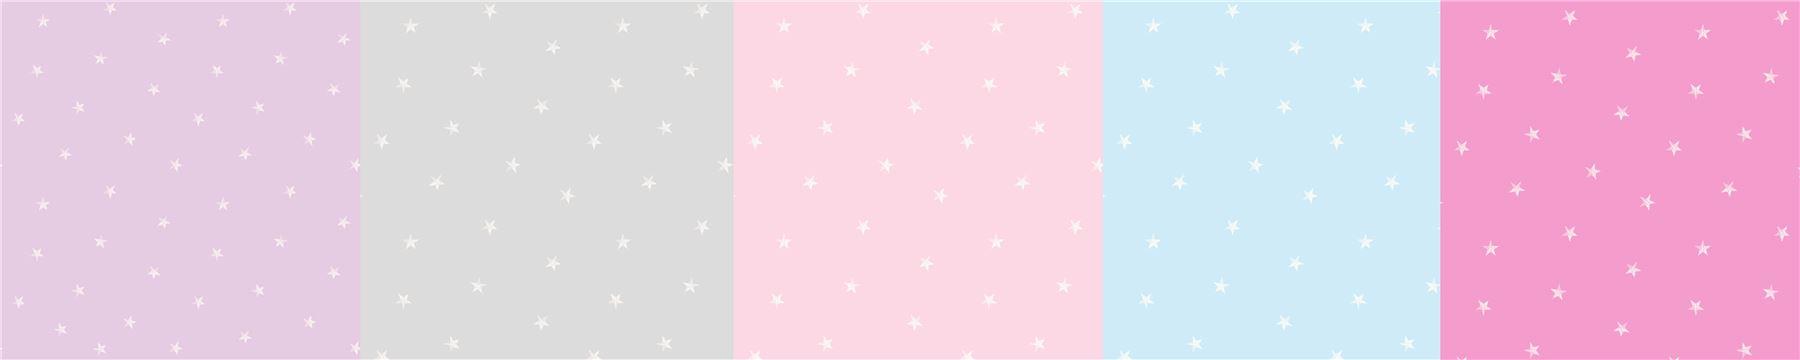 Pastel Blue Lilac Pink Grey White Stars Boys Girls Kids Nursery Baby Wallpaper